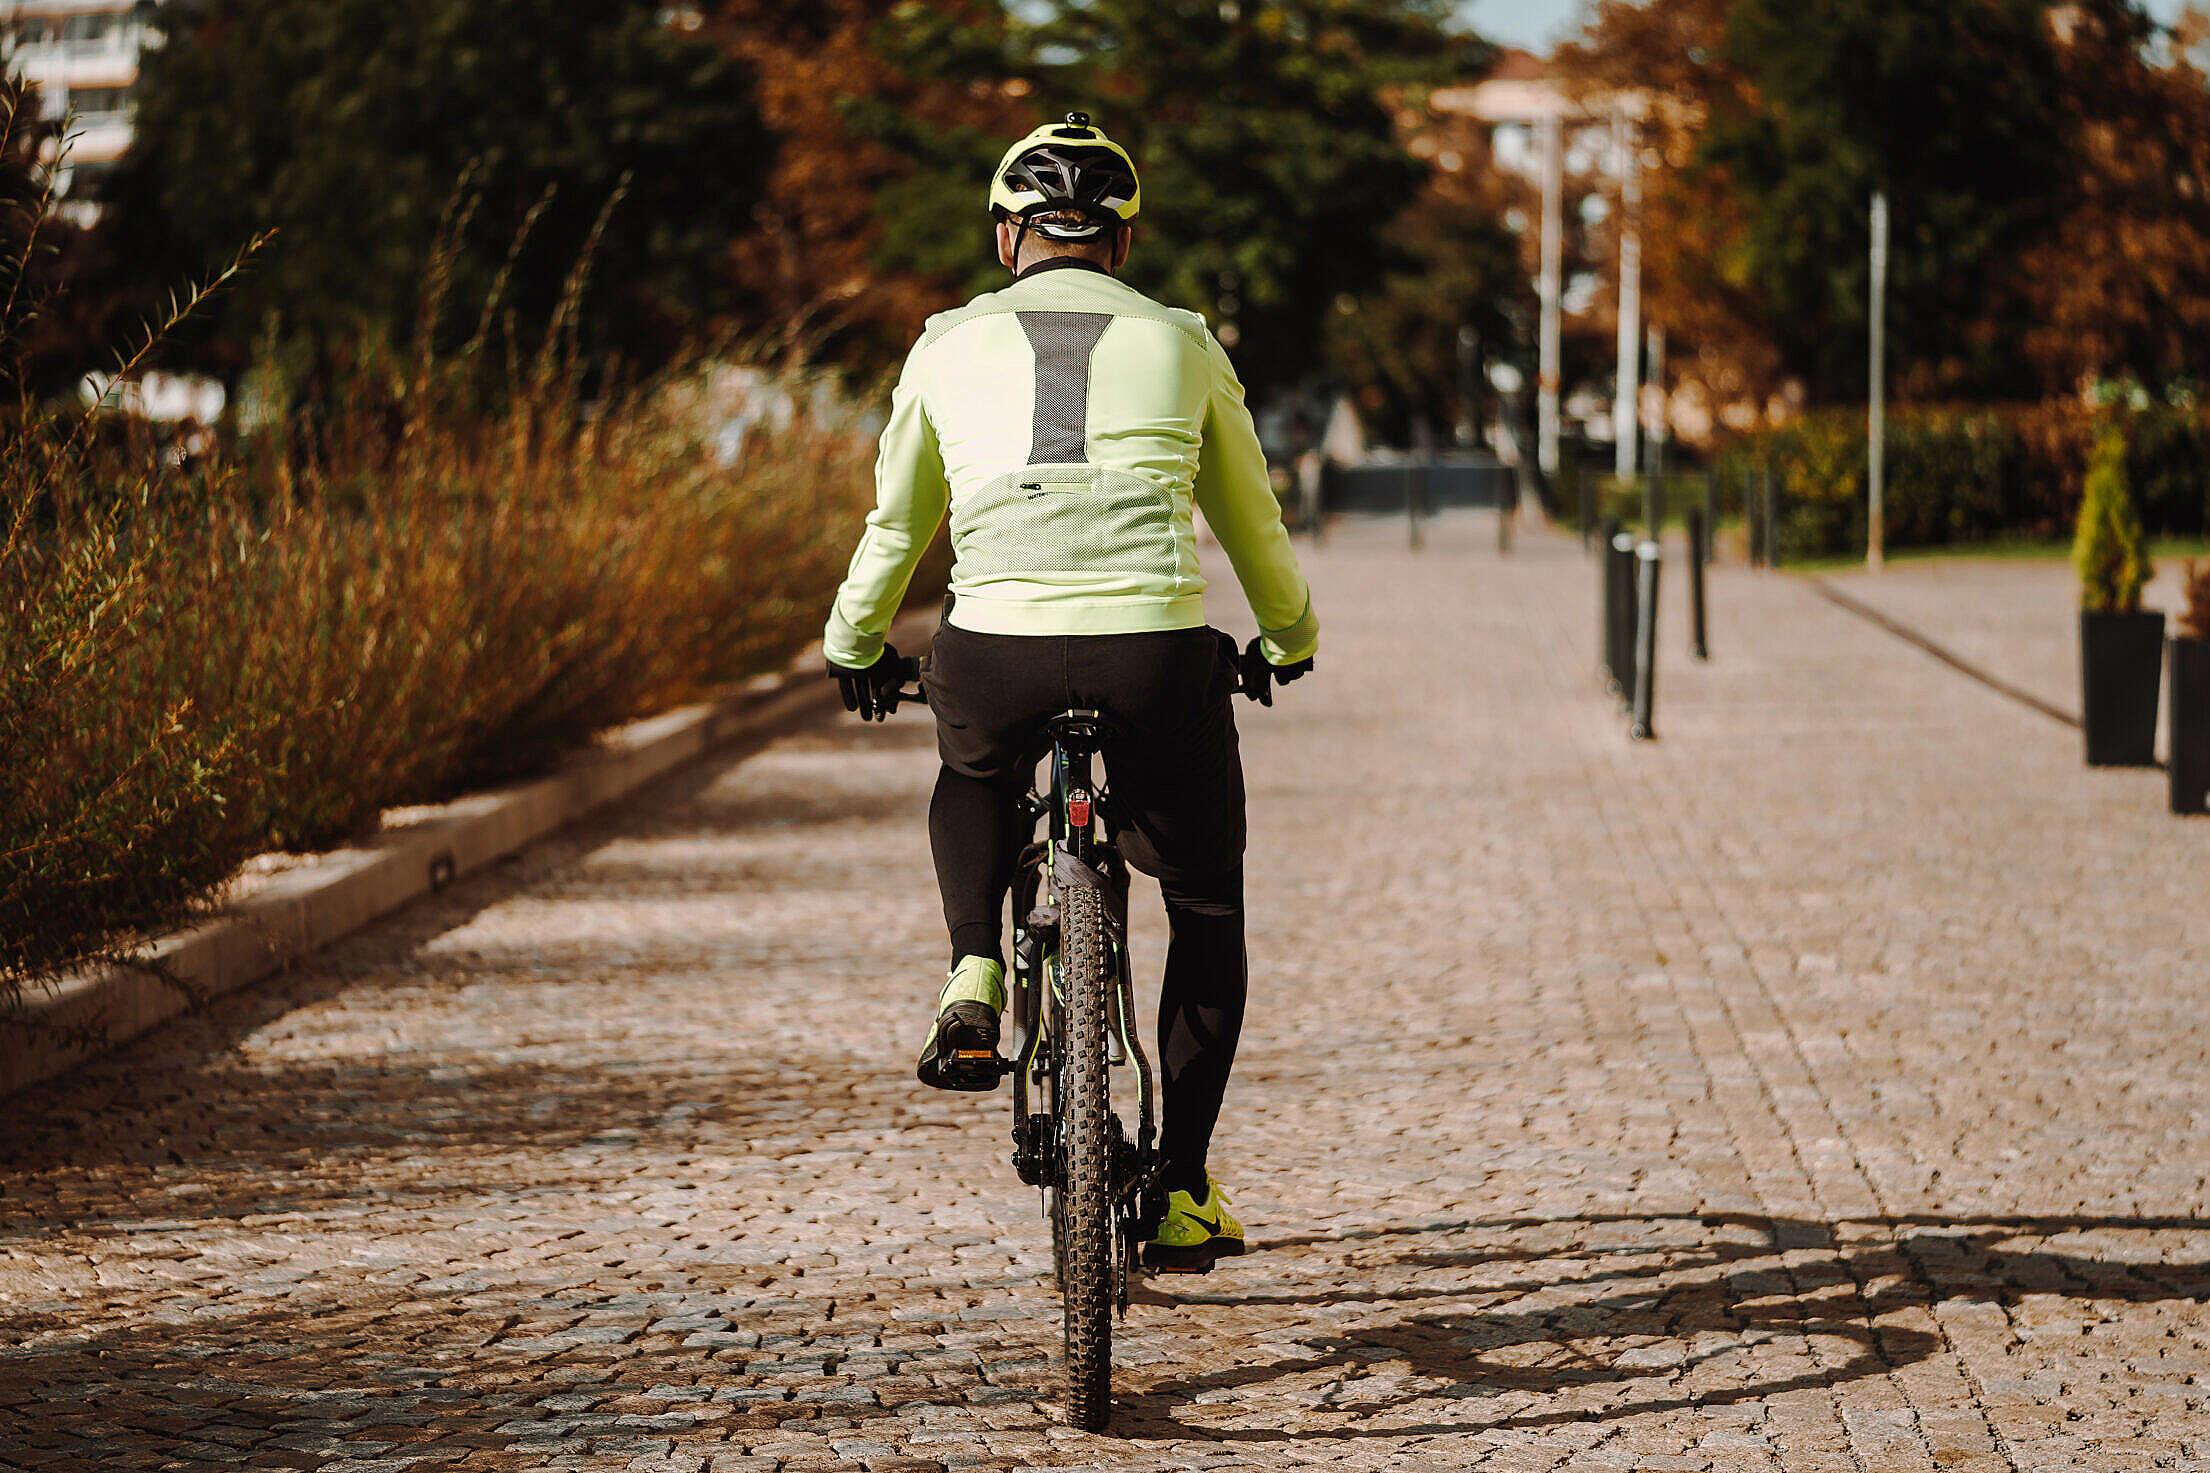 Man on a Bike in Fall Free Stock Photo